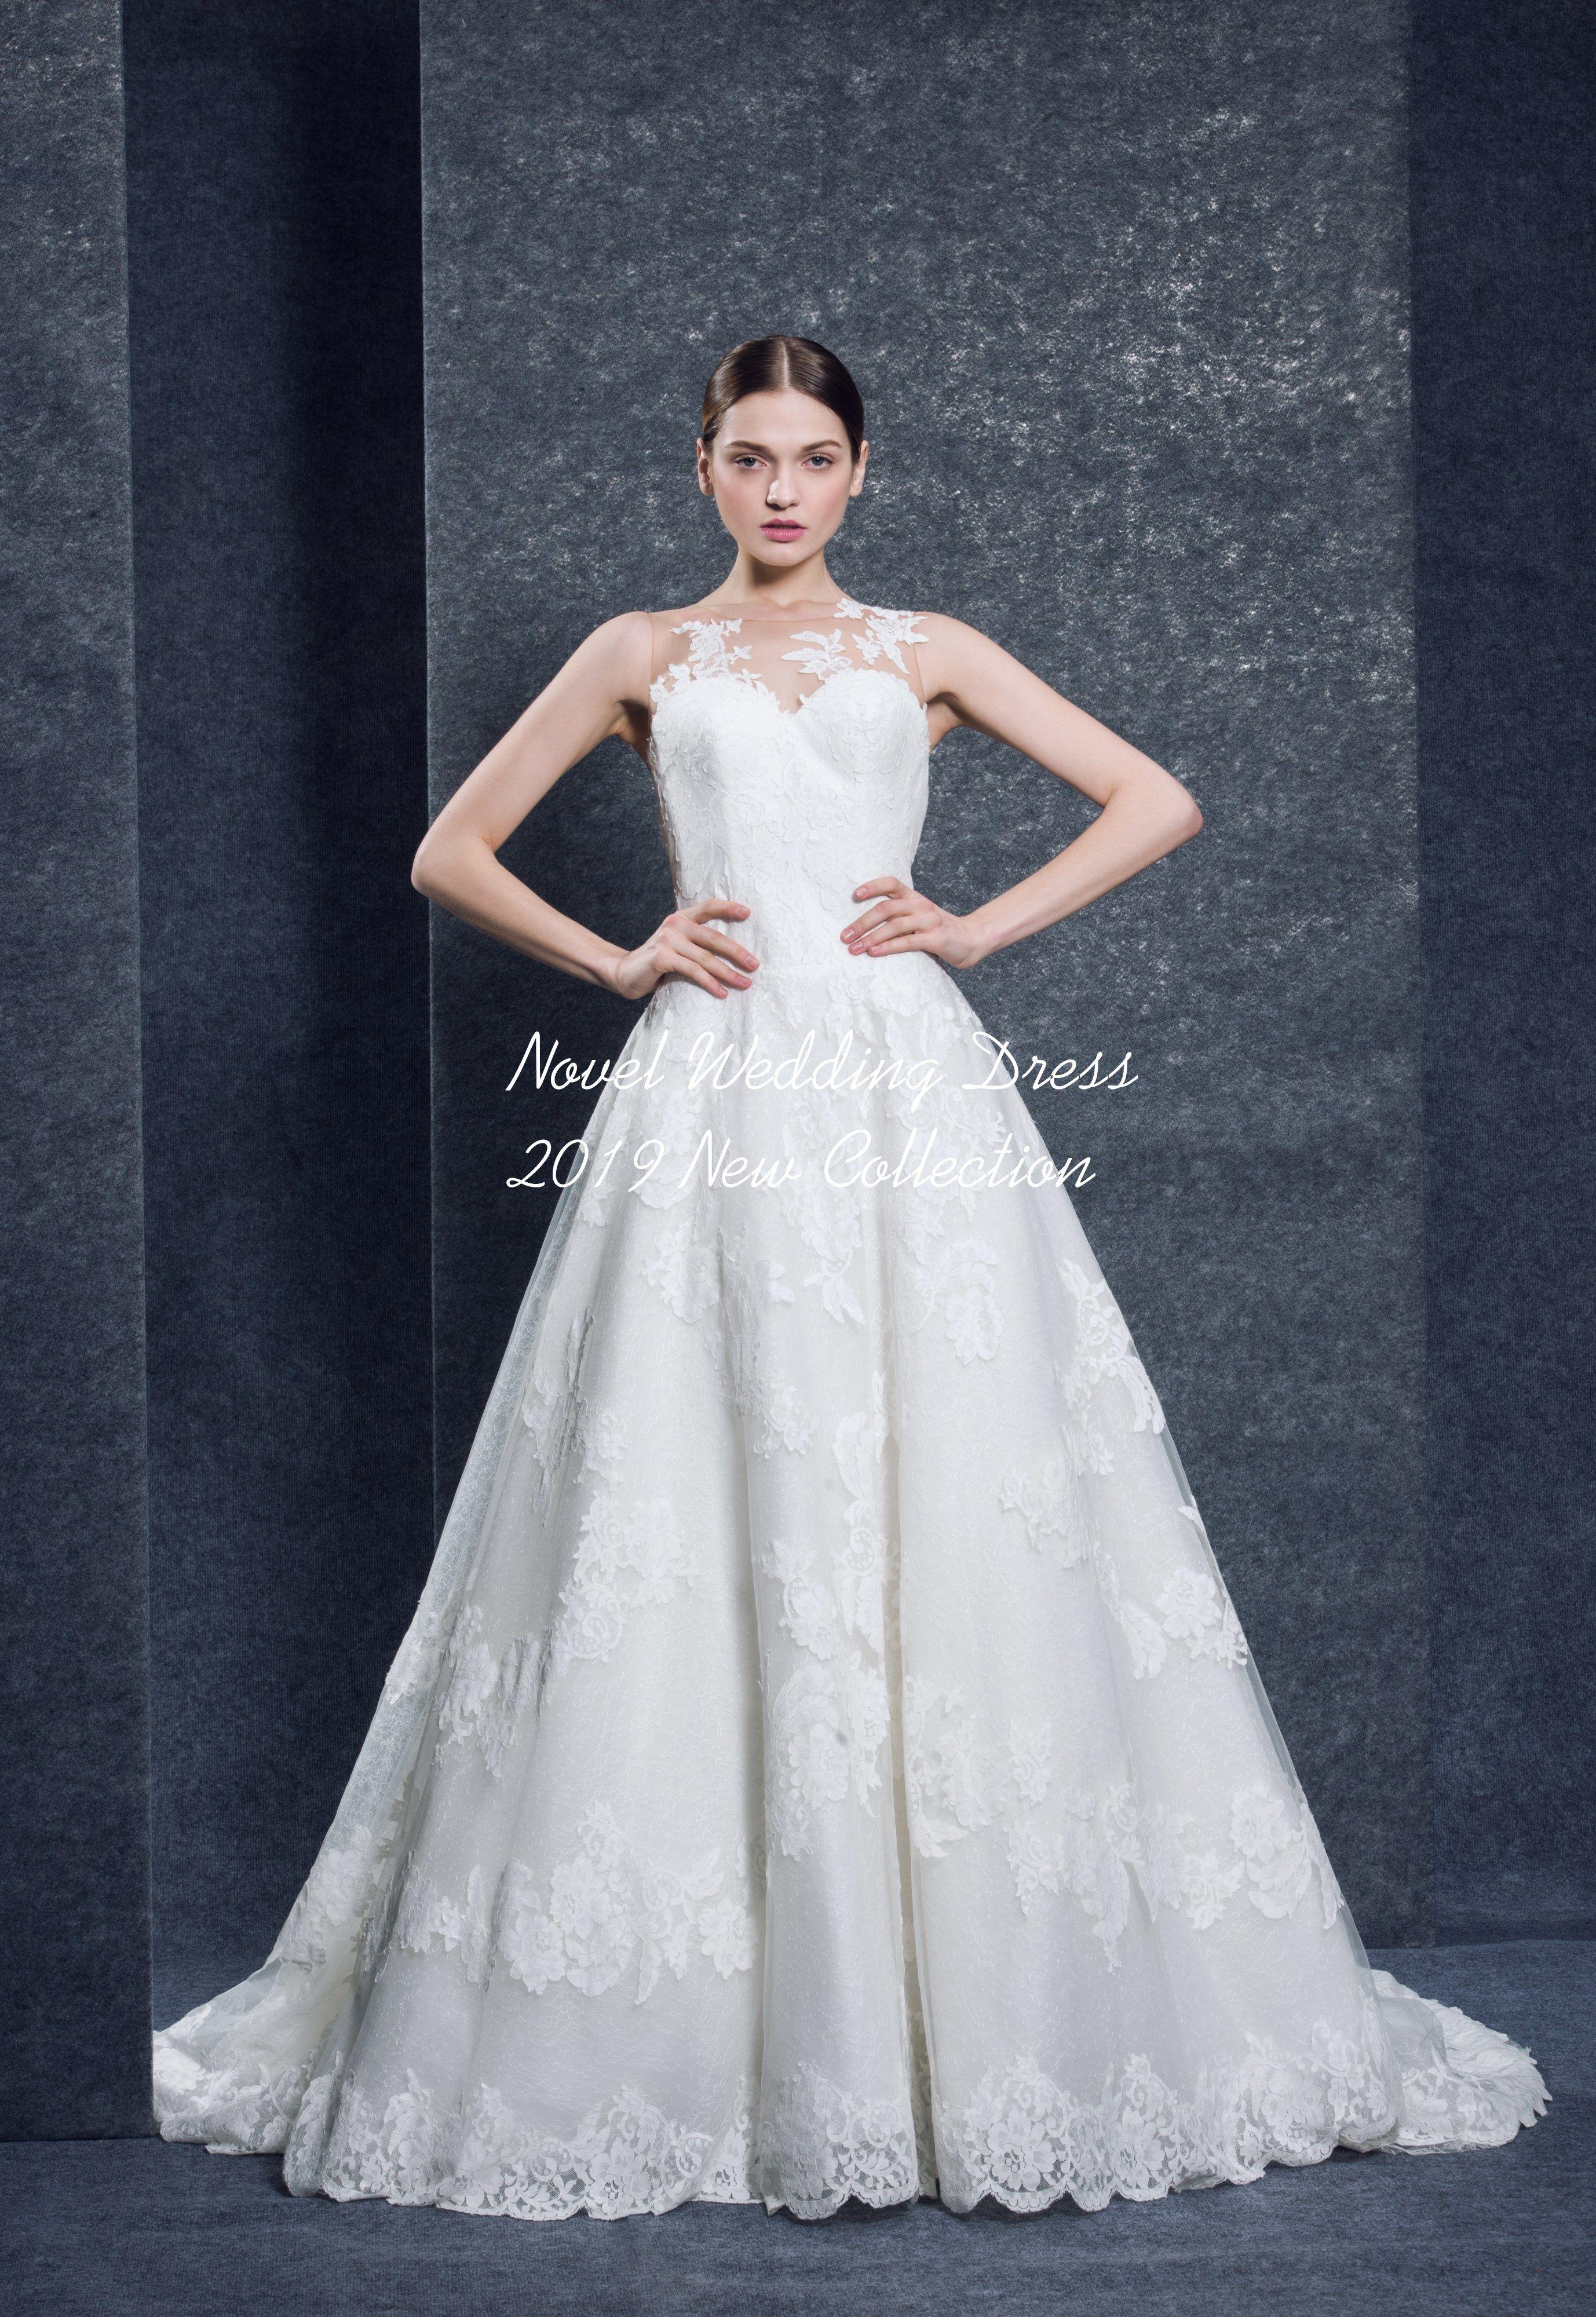 Wedding dress for evening  wedding dresses bridal  custommade wedding dresses bridesmaid